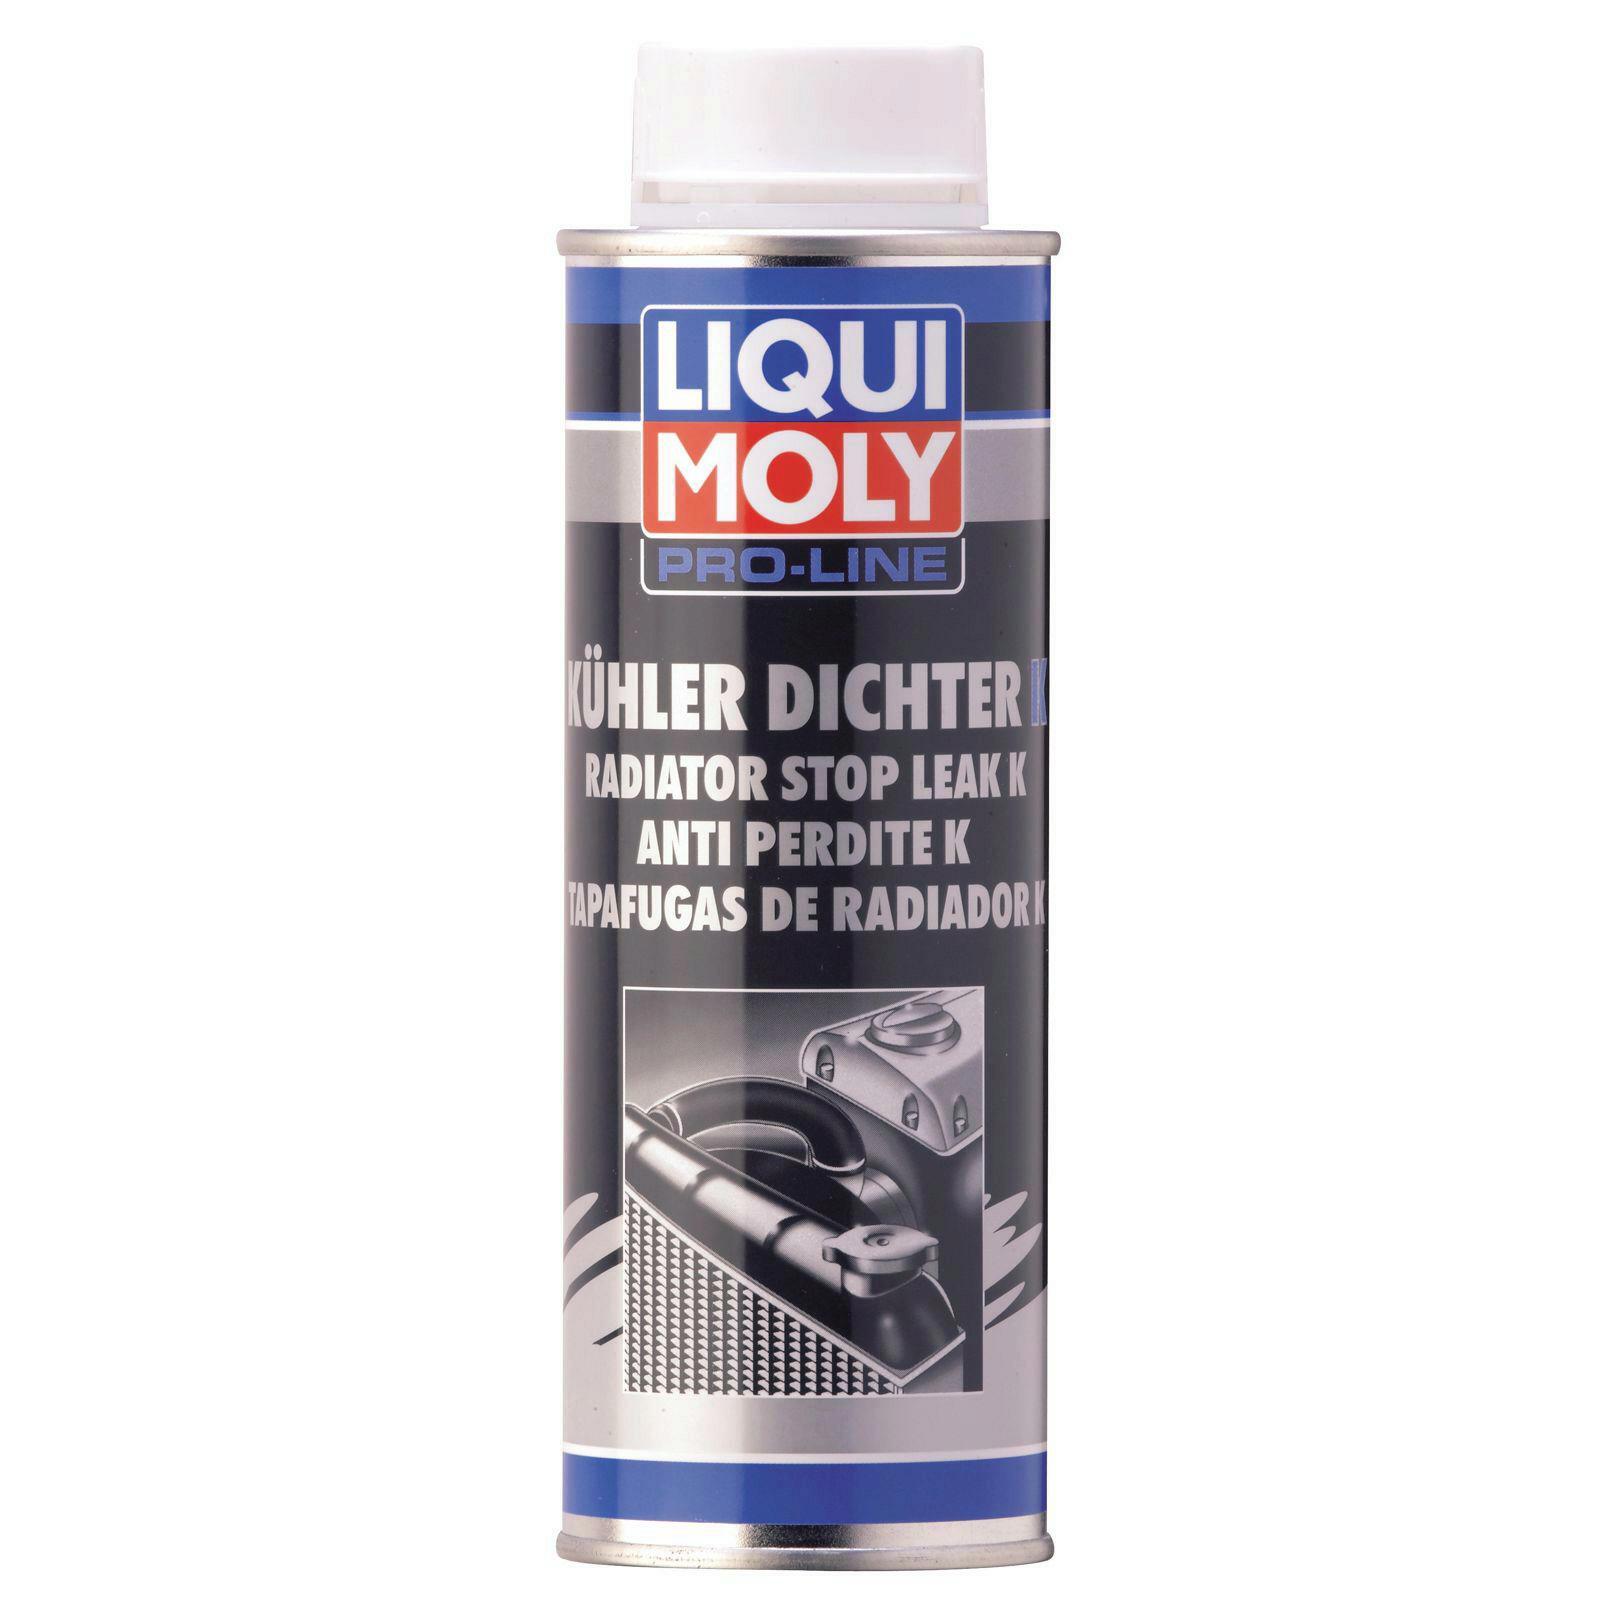 Liqui Moly Pro-Line Kühler-Dichter K 250ml